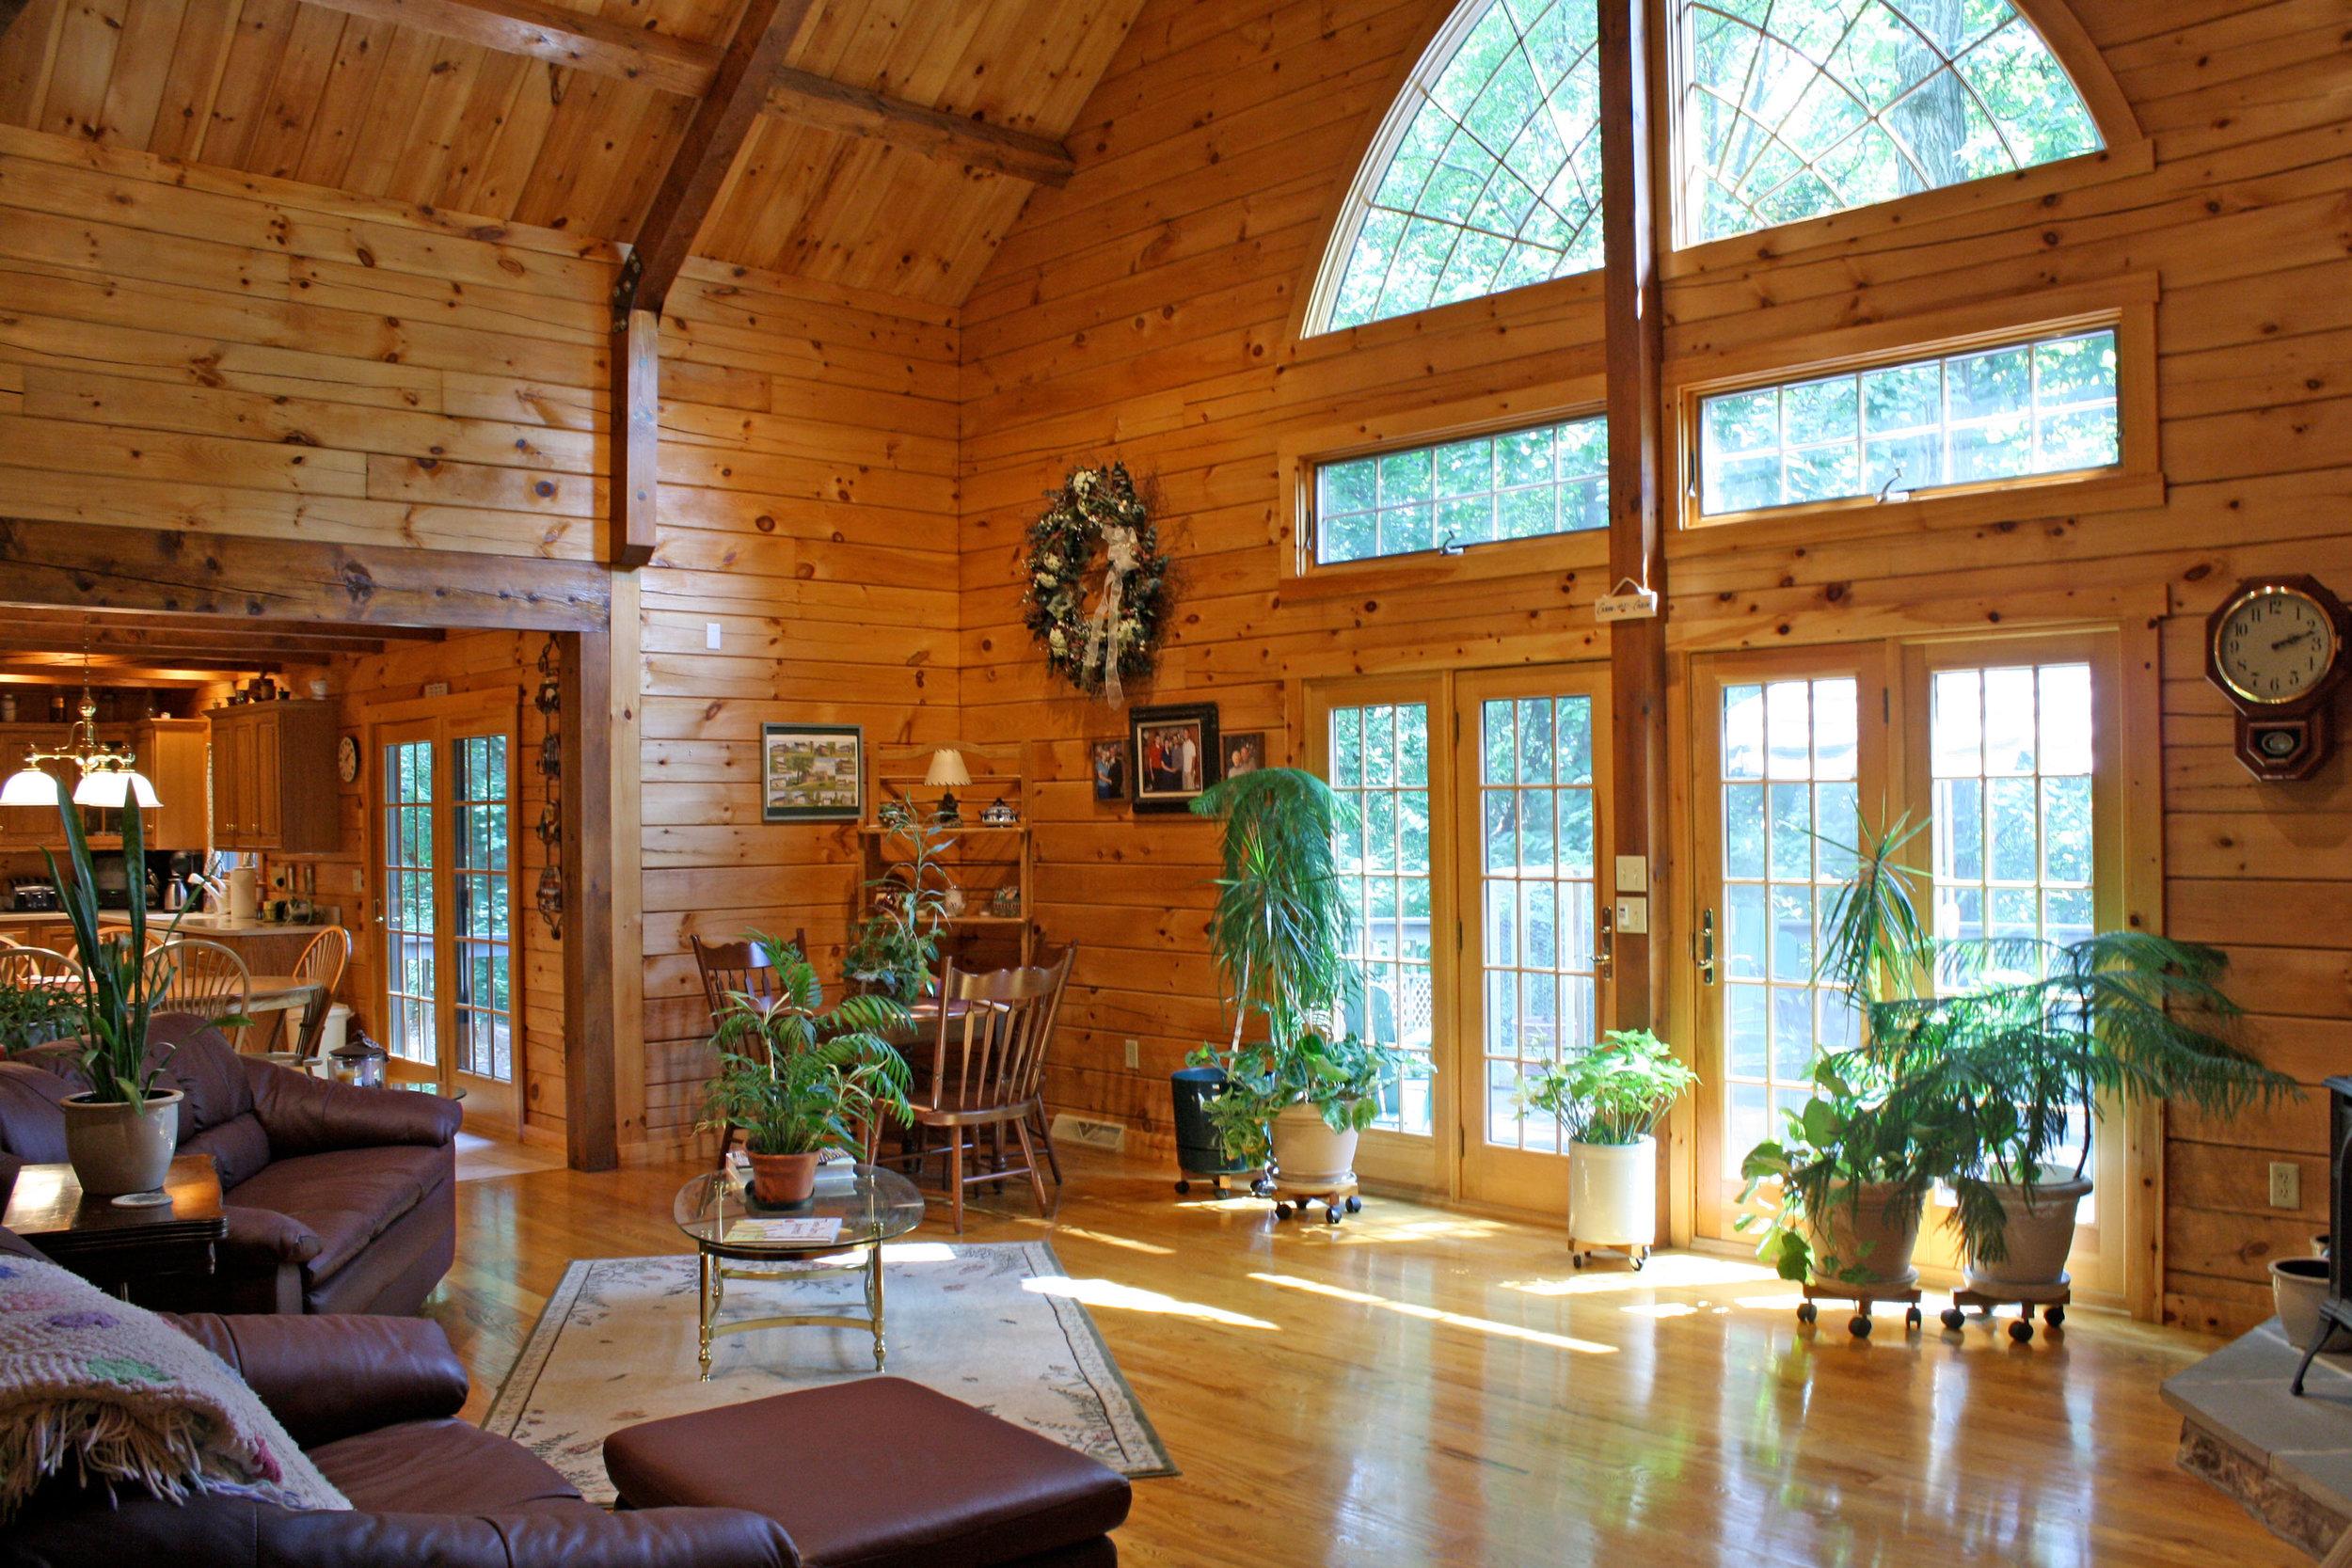 cabin-interior-full-view.jpg